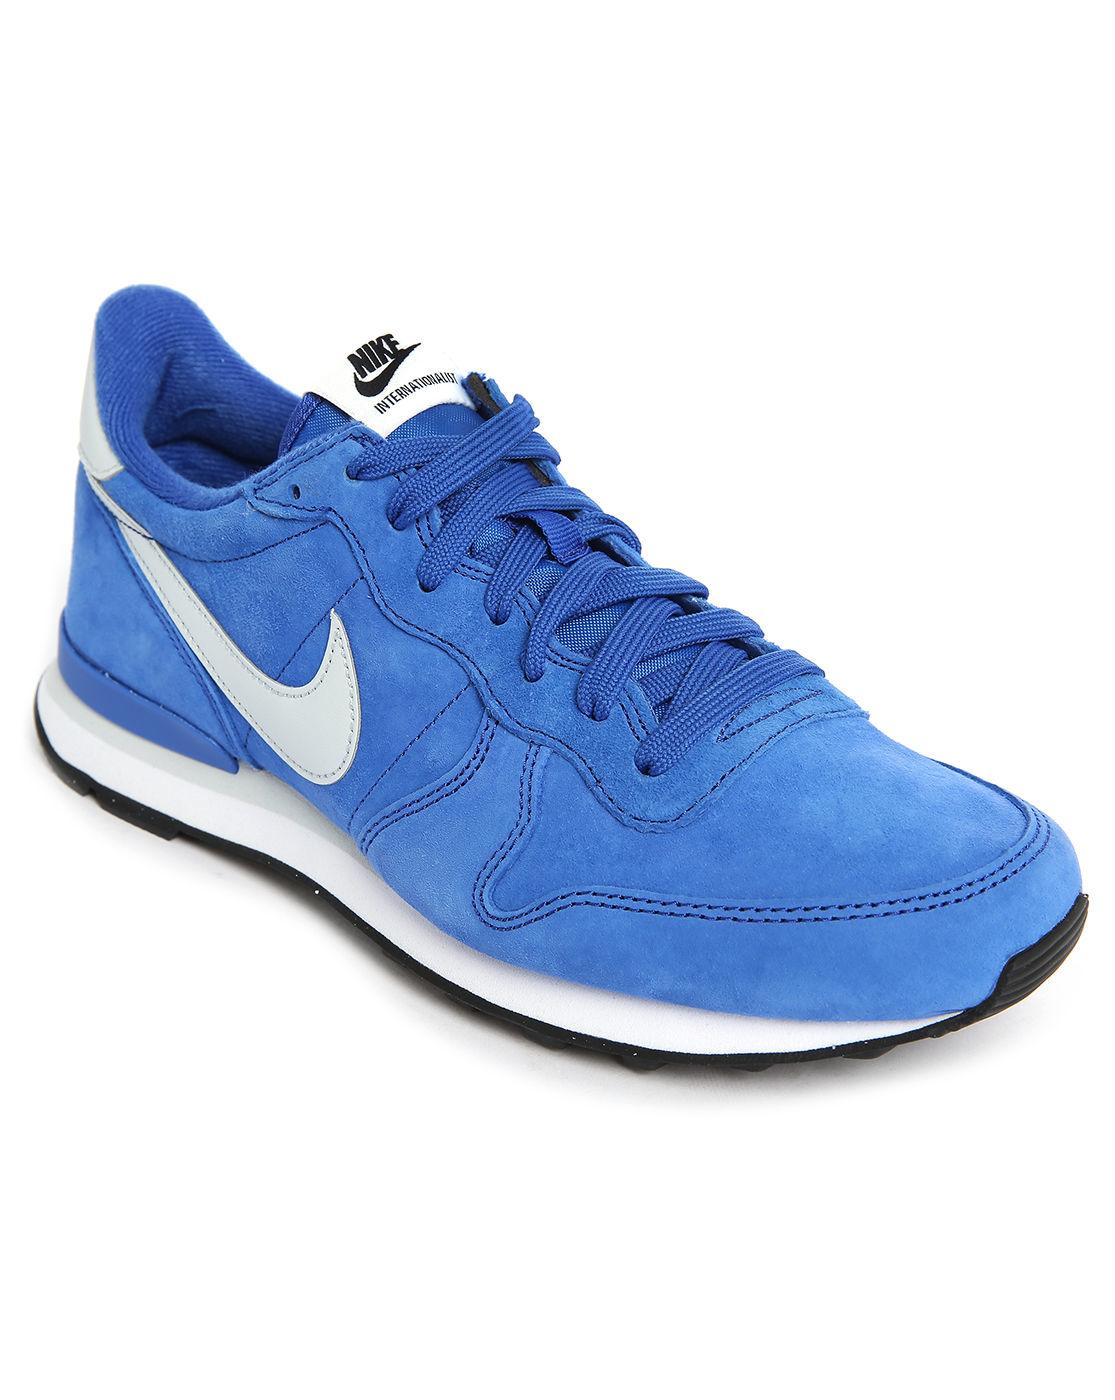 Nike Internationalist Blue Suede - 388.6KB